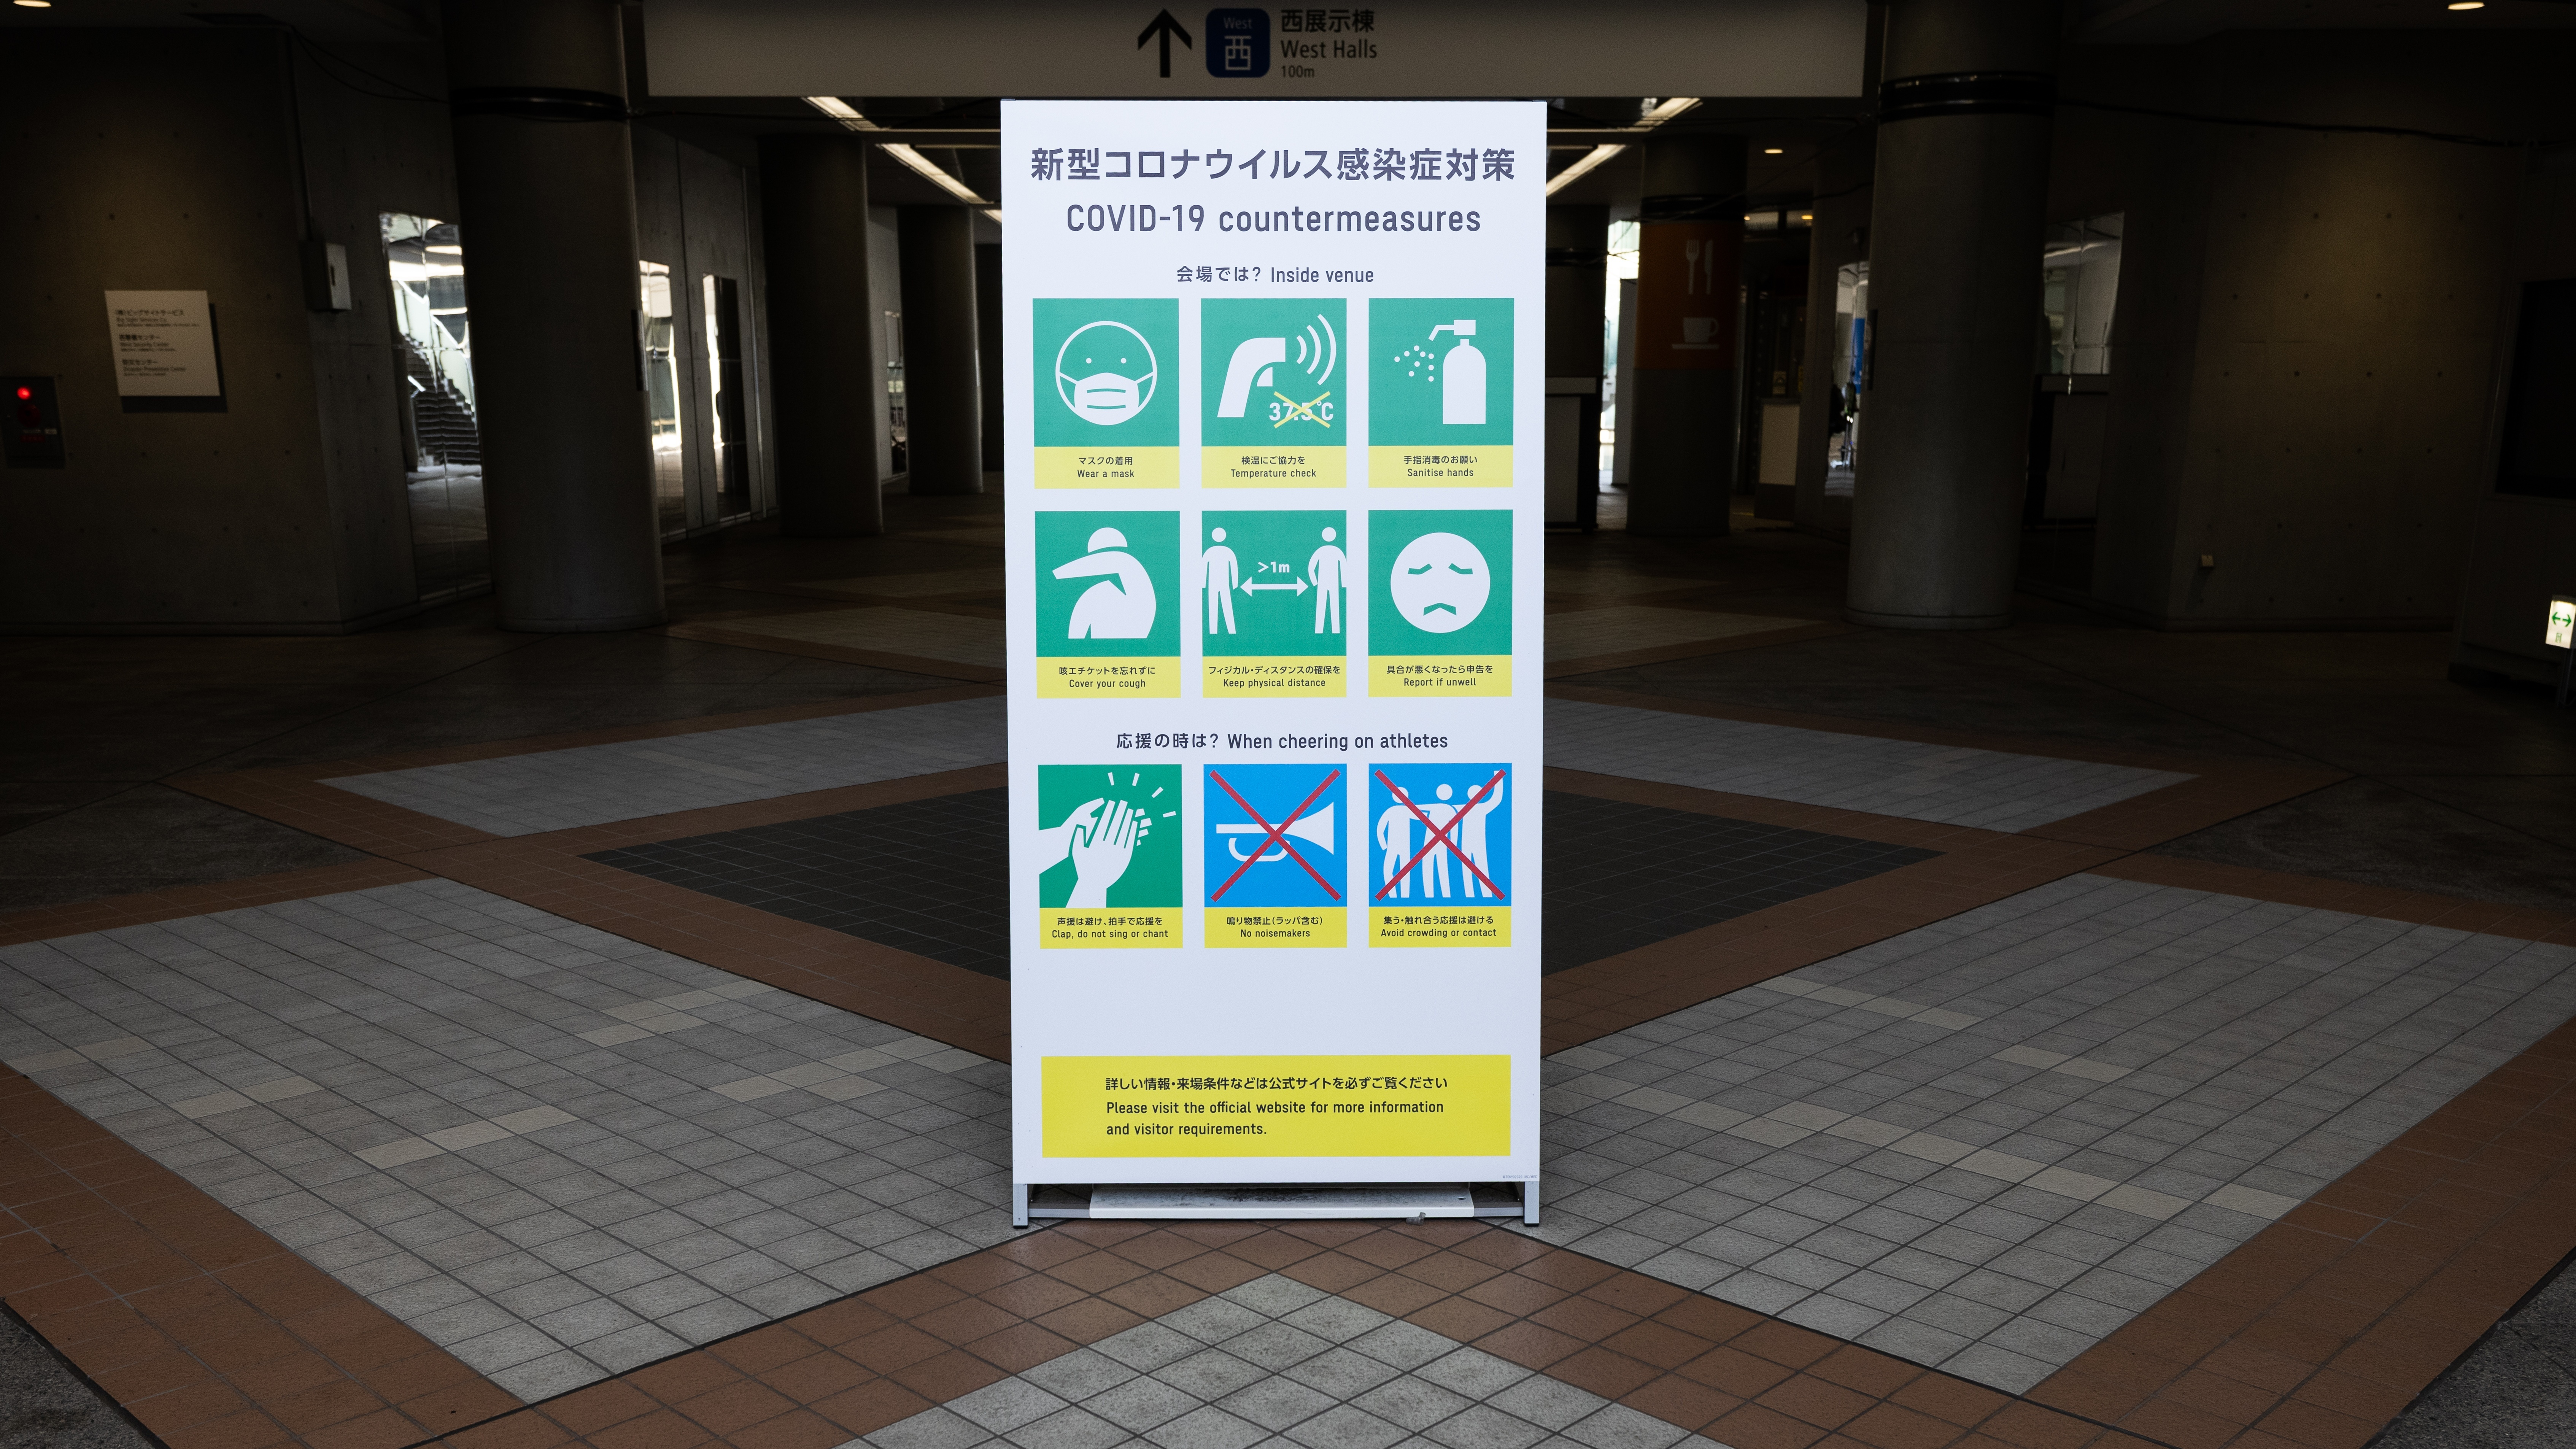 Tokyo Olympics health precautions